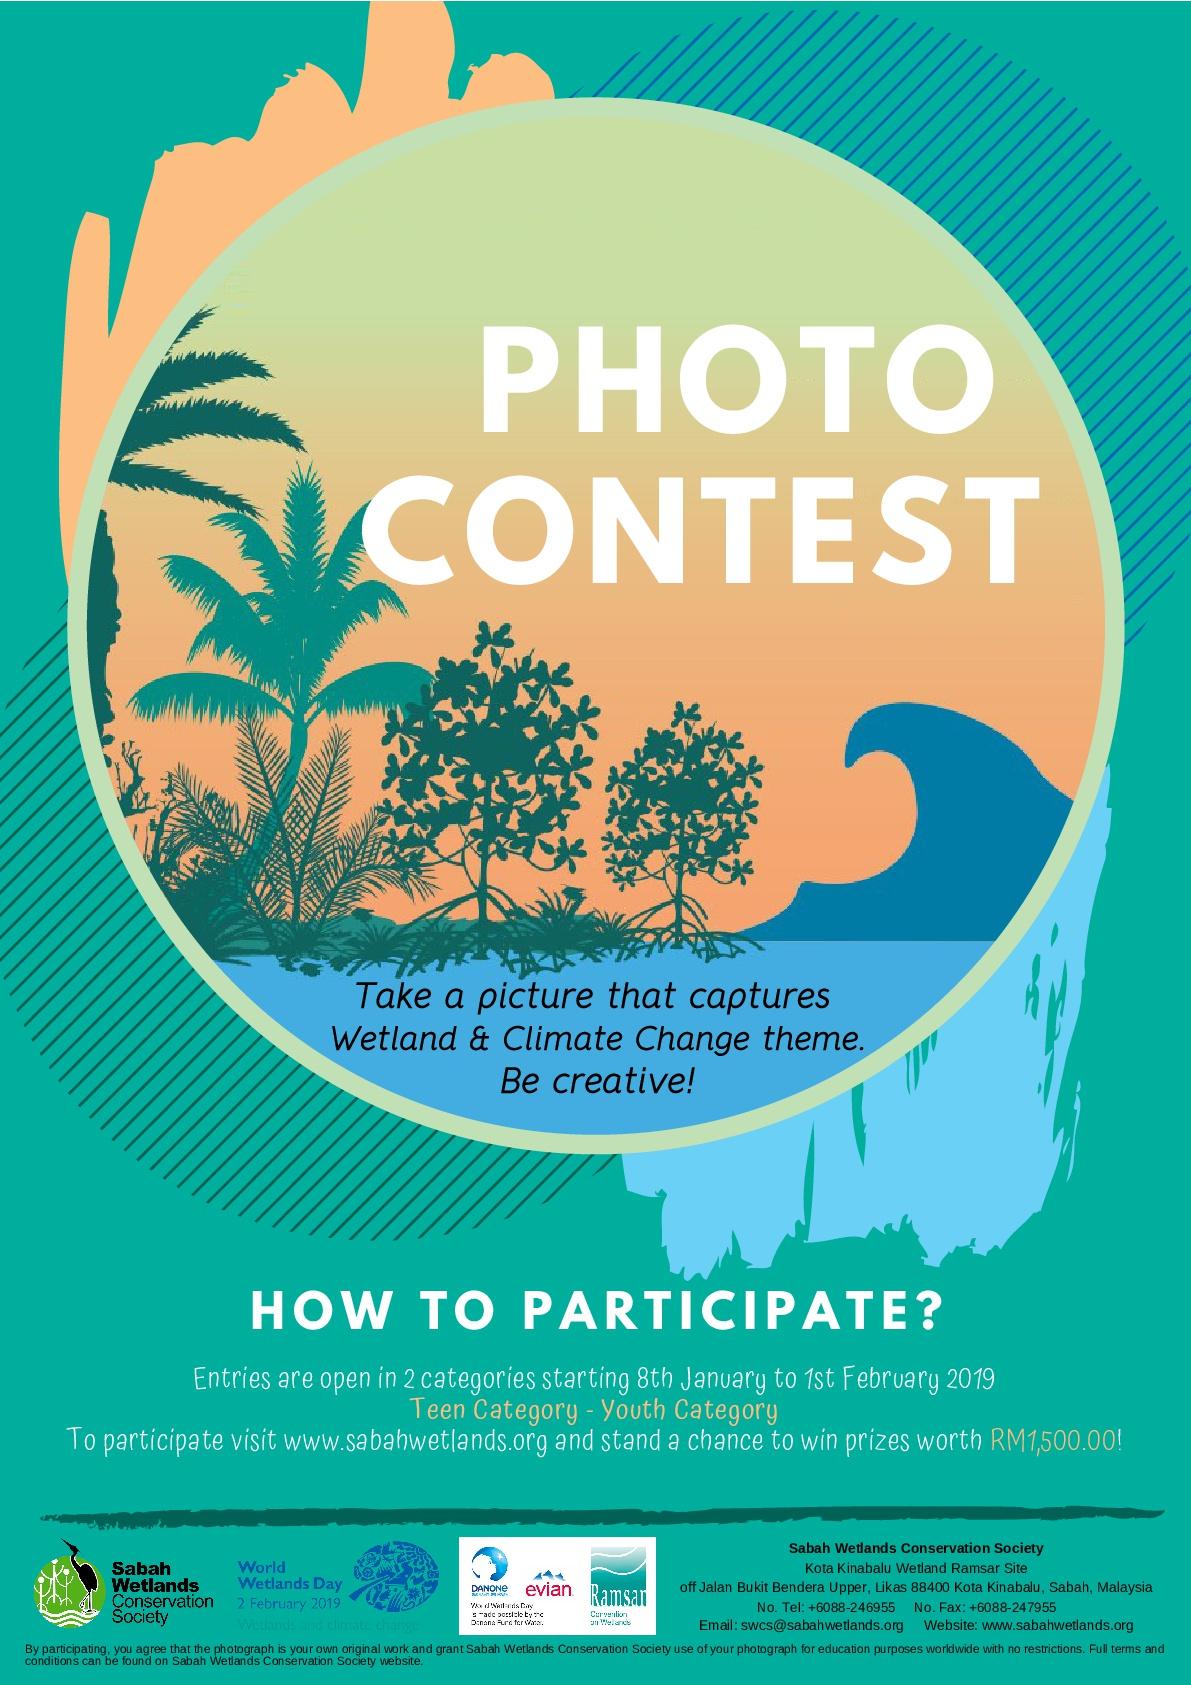 PHOTO CONTEST (WORLD WETLANDS DAY 2019) | Kota Kinabalu Wetland